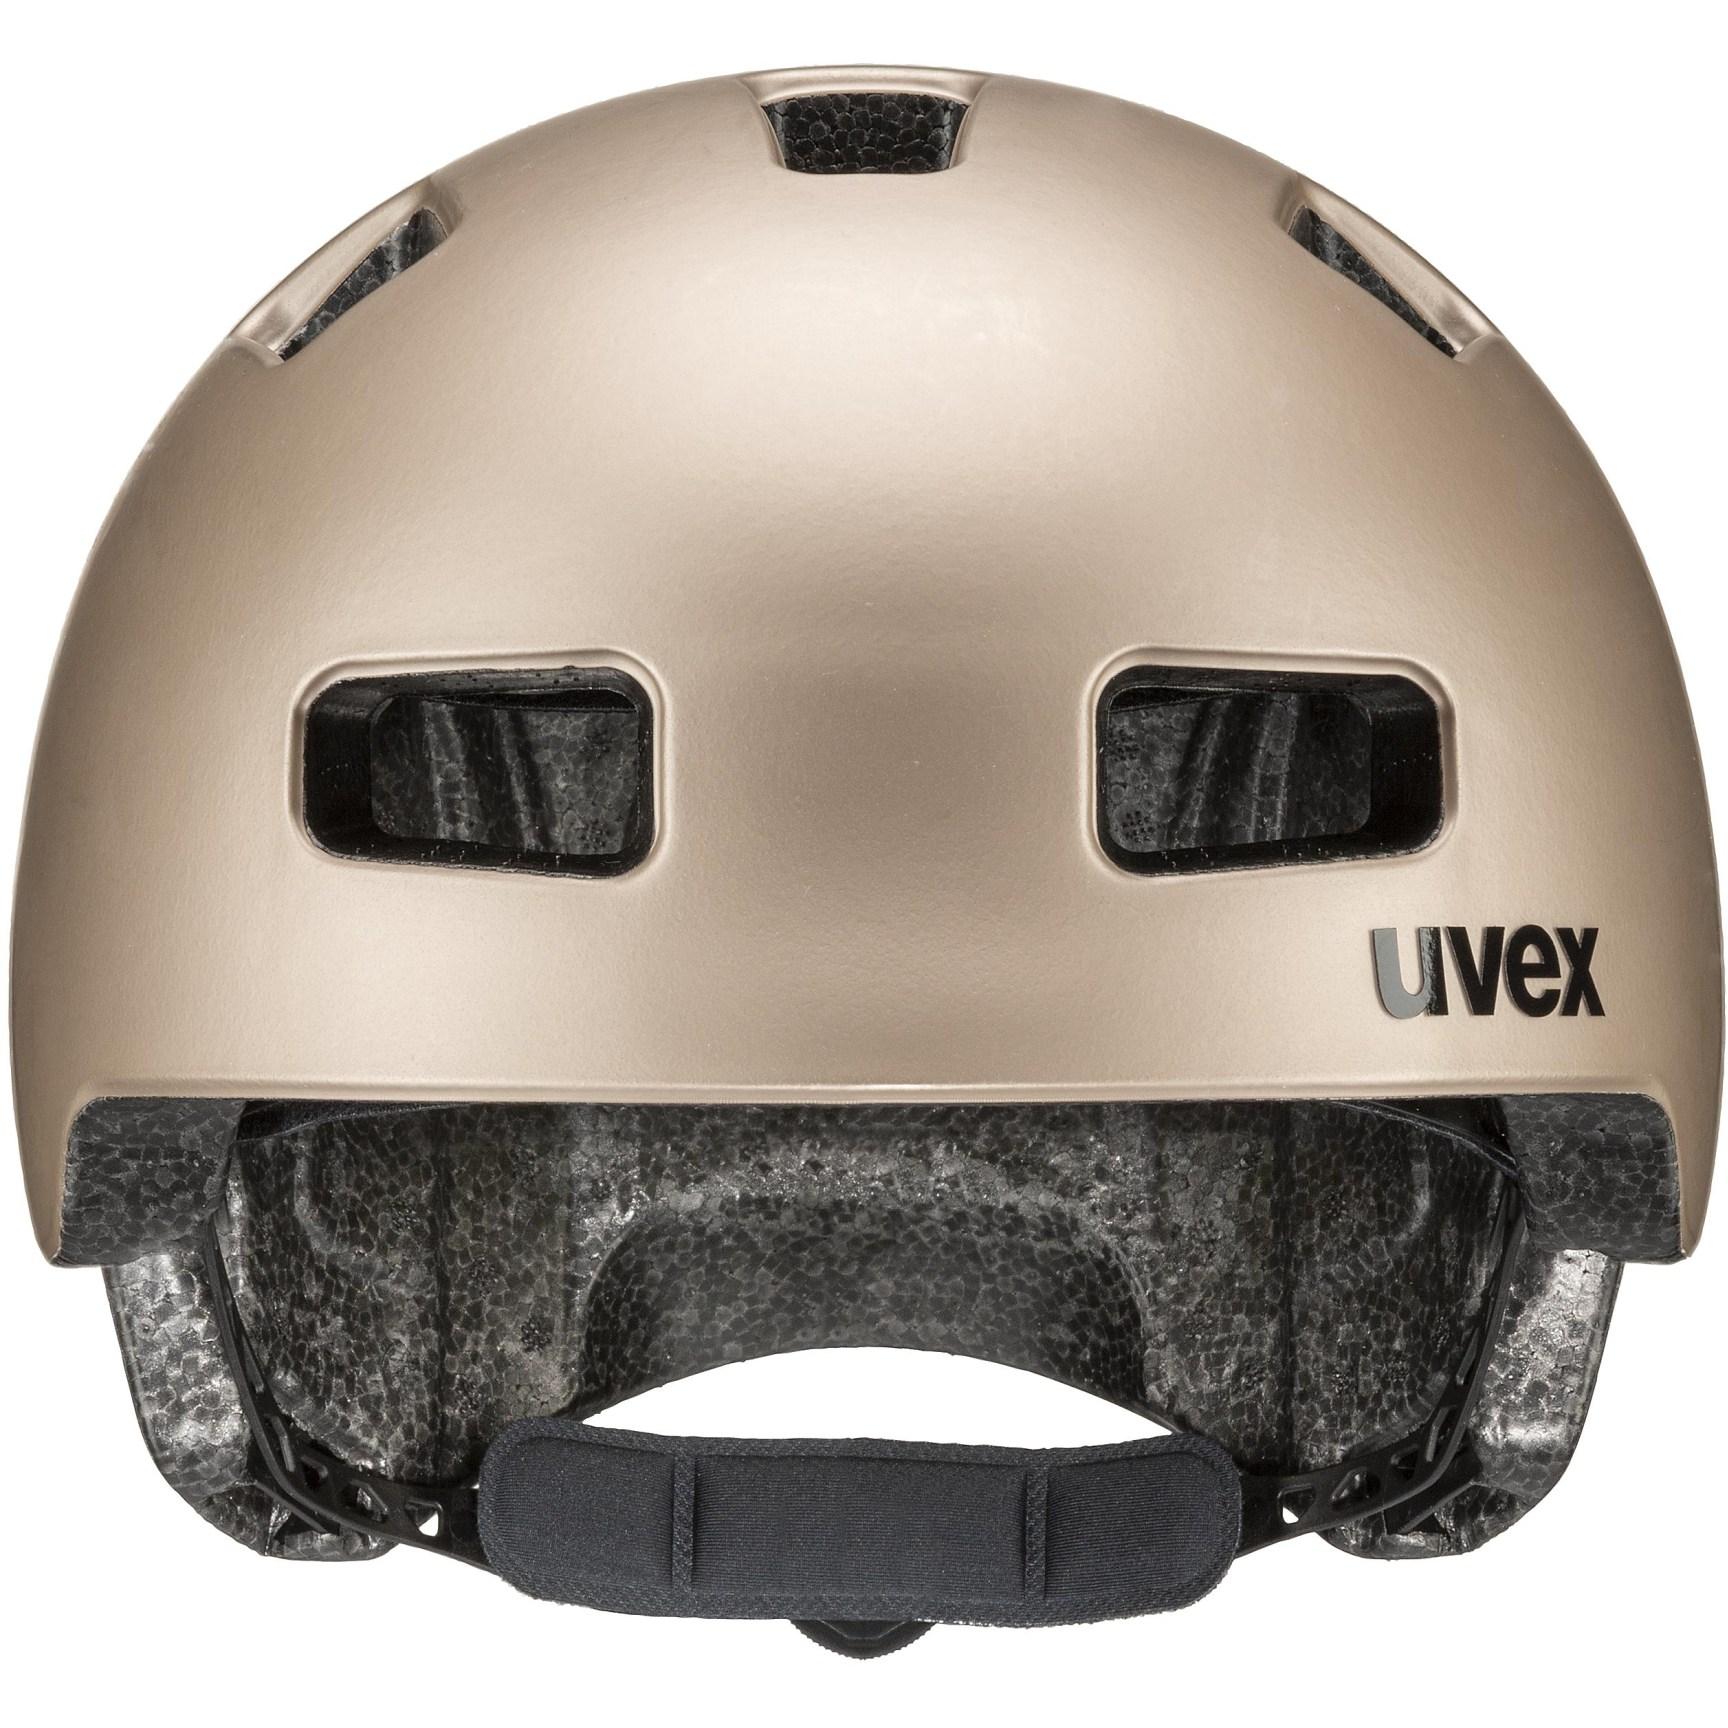 Image of Uvex city 4 Helmet - soft gold mat